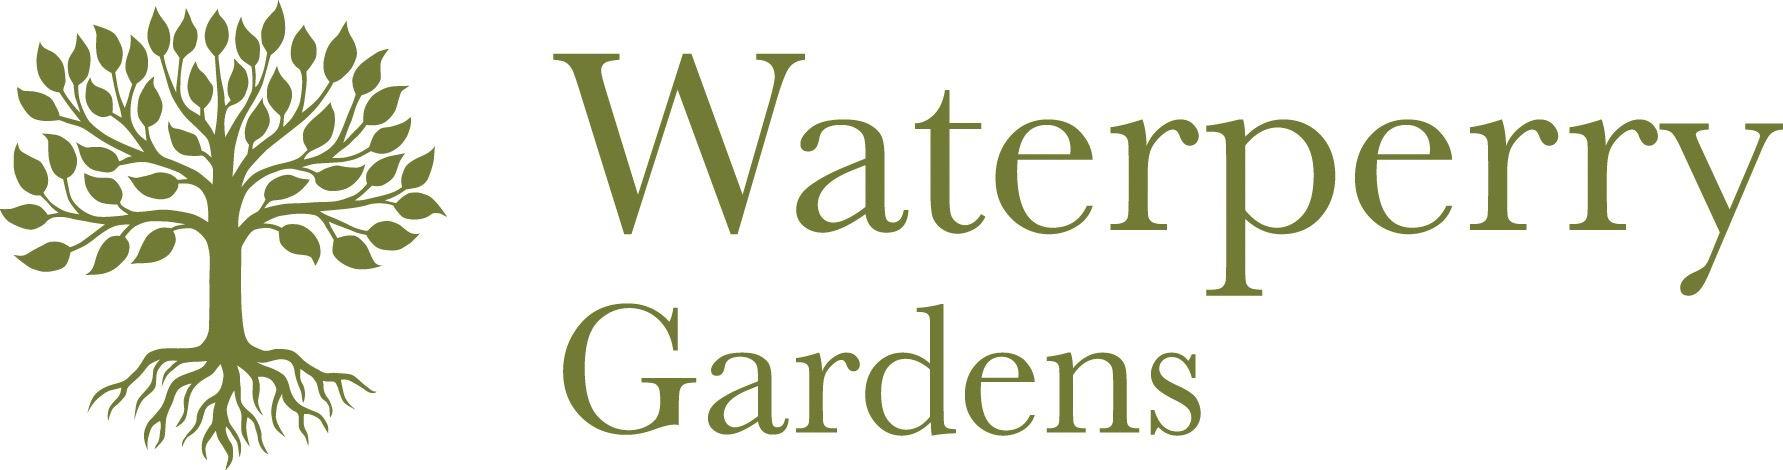 Waterperry Gardens's logo